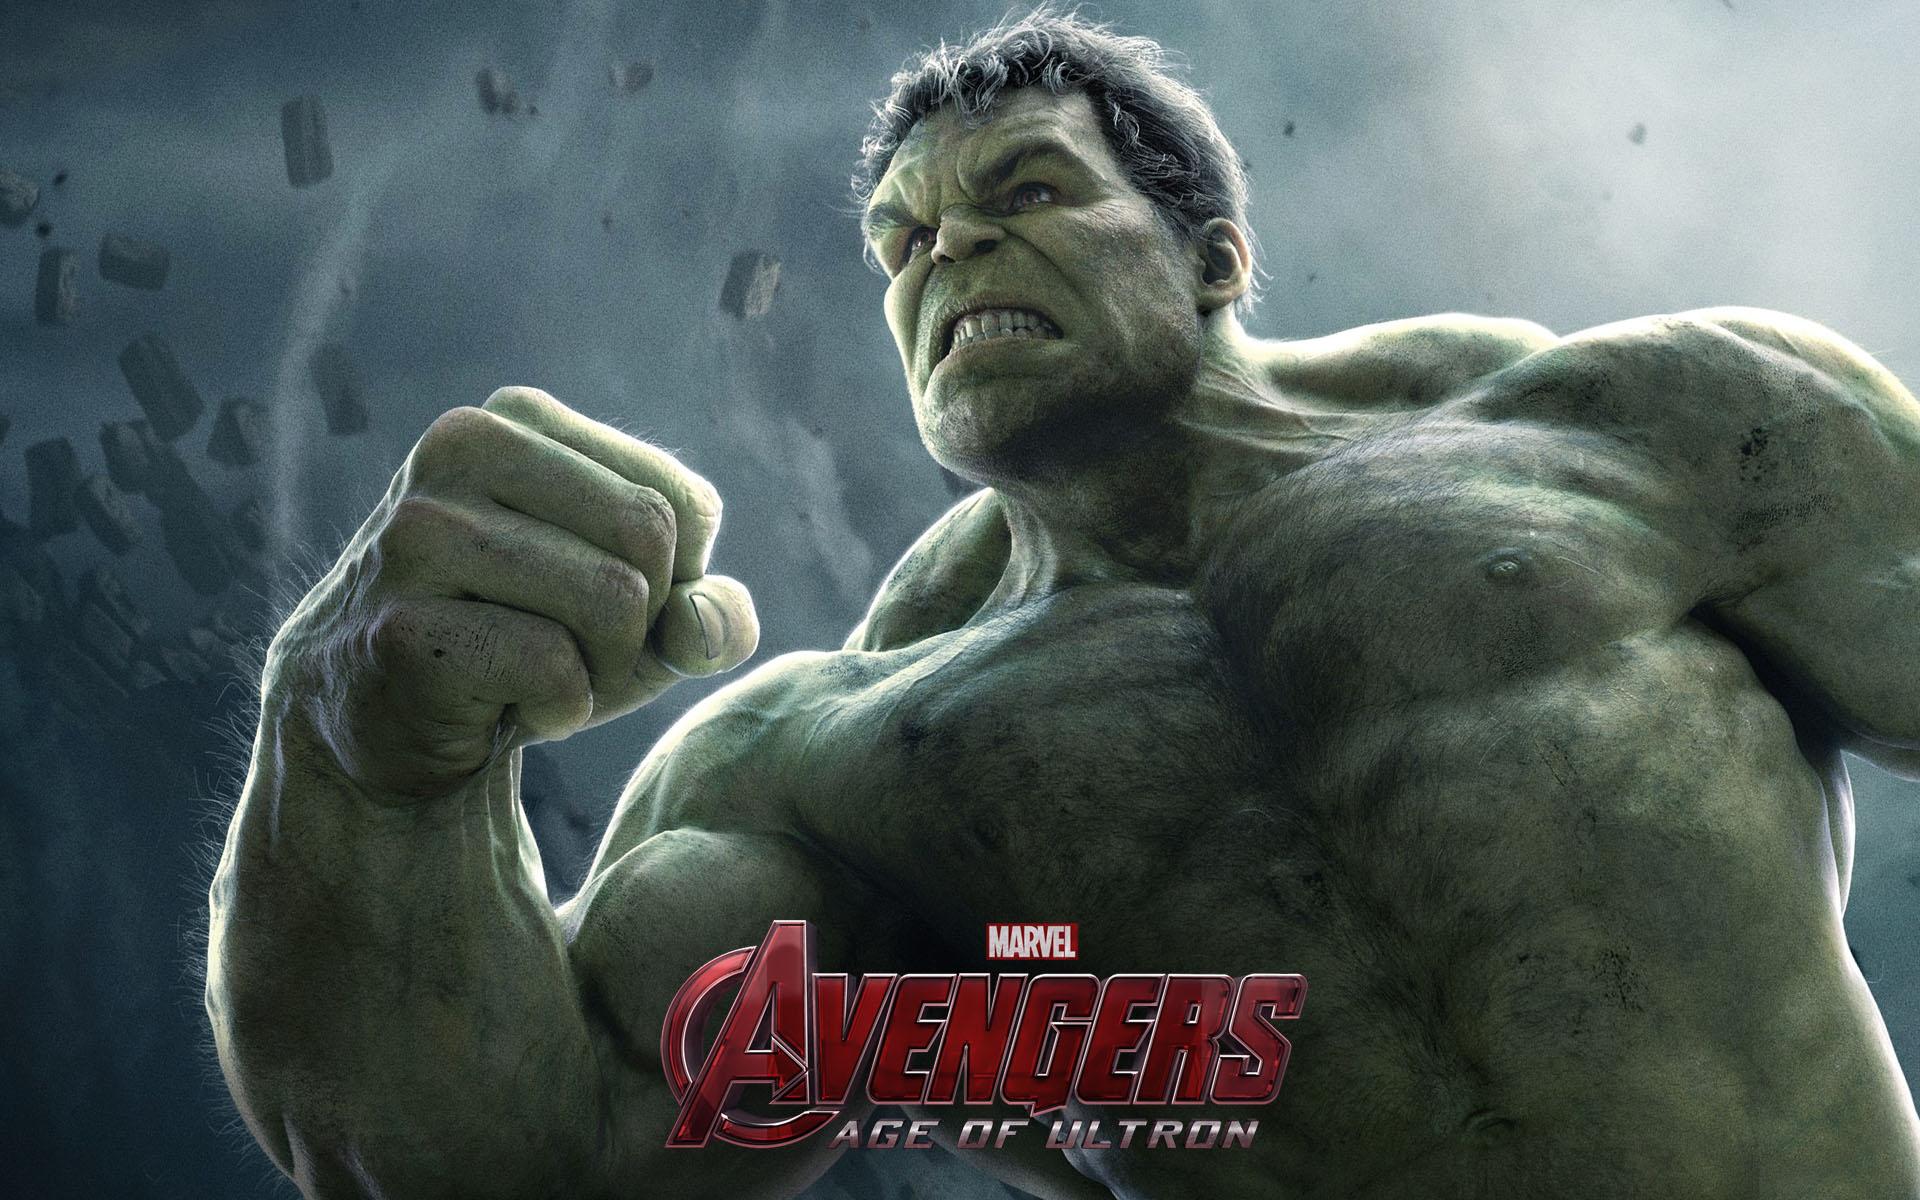 Avengers 2 Age Of Ultron Movie Showcase